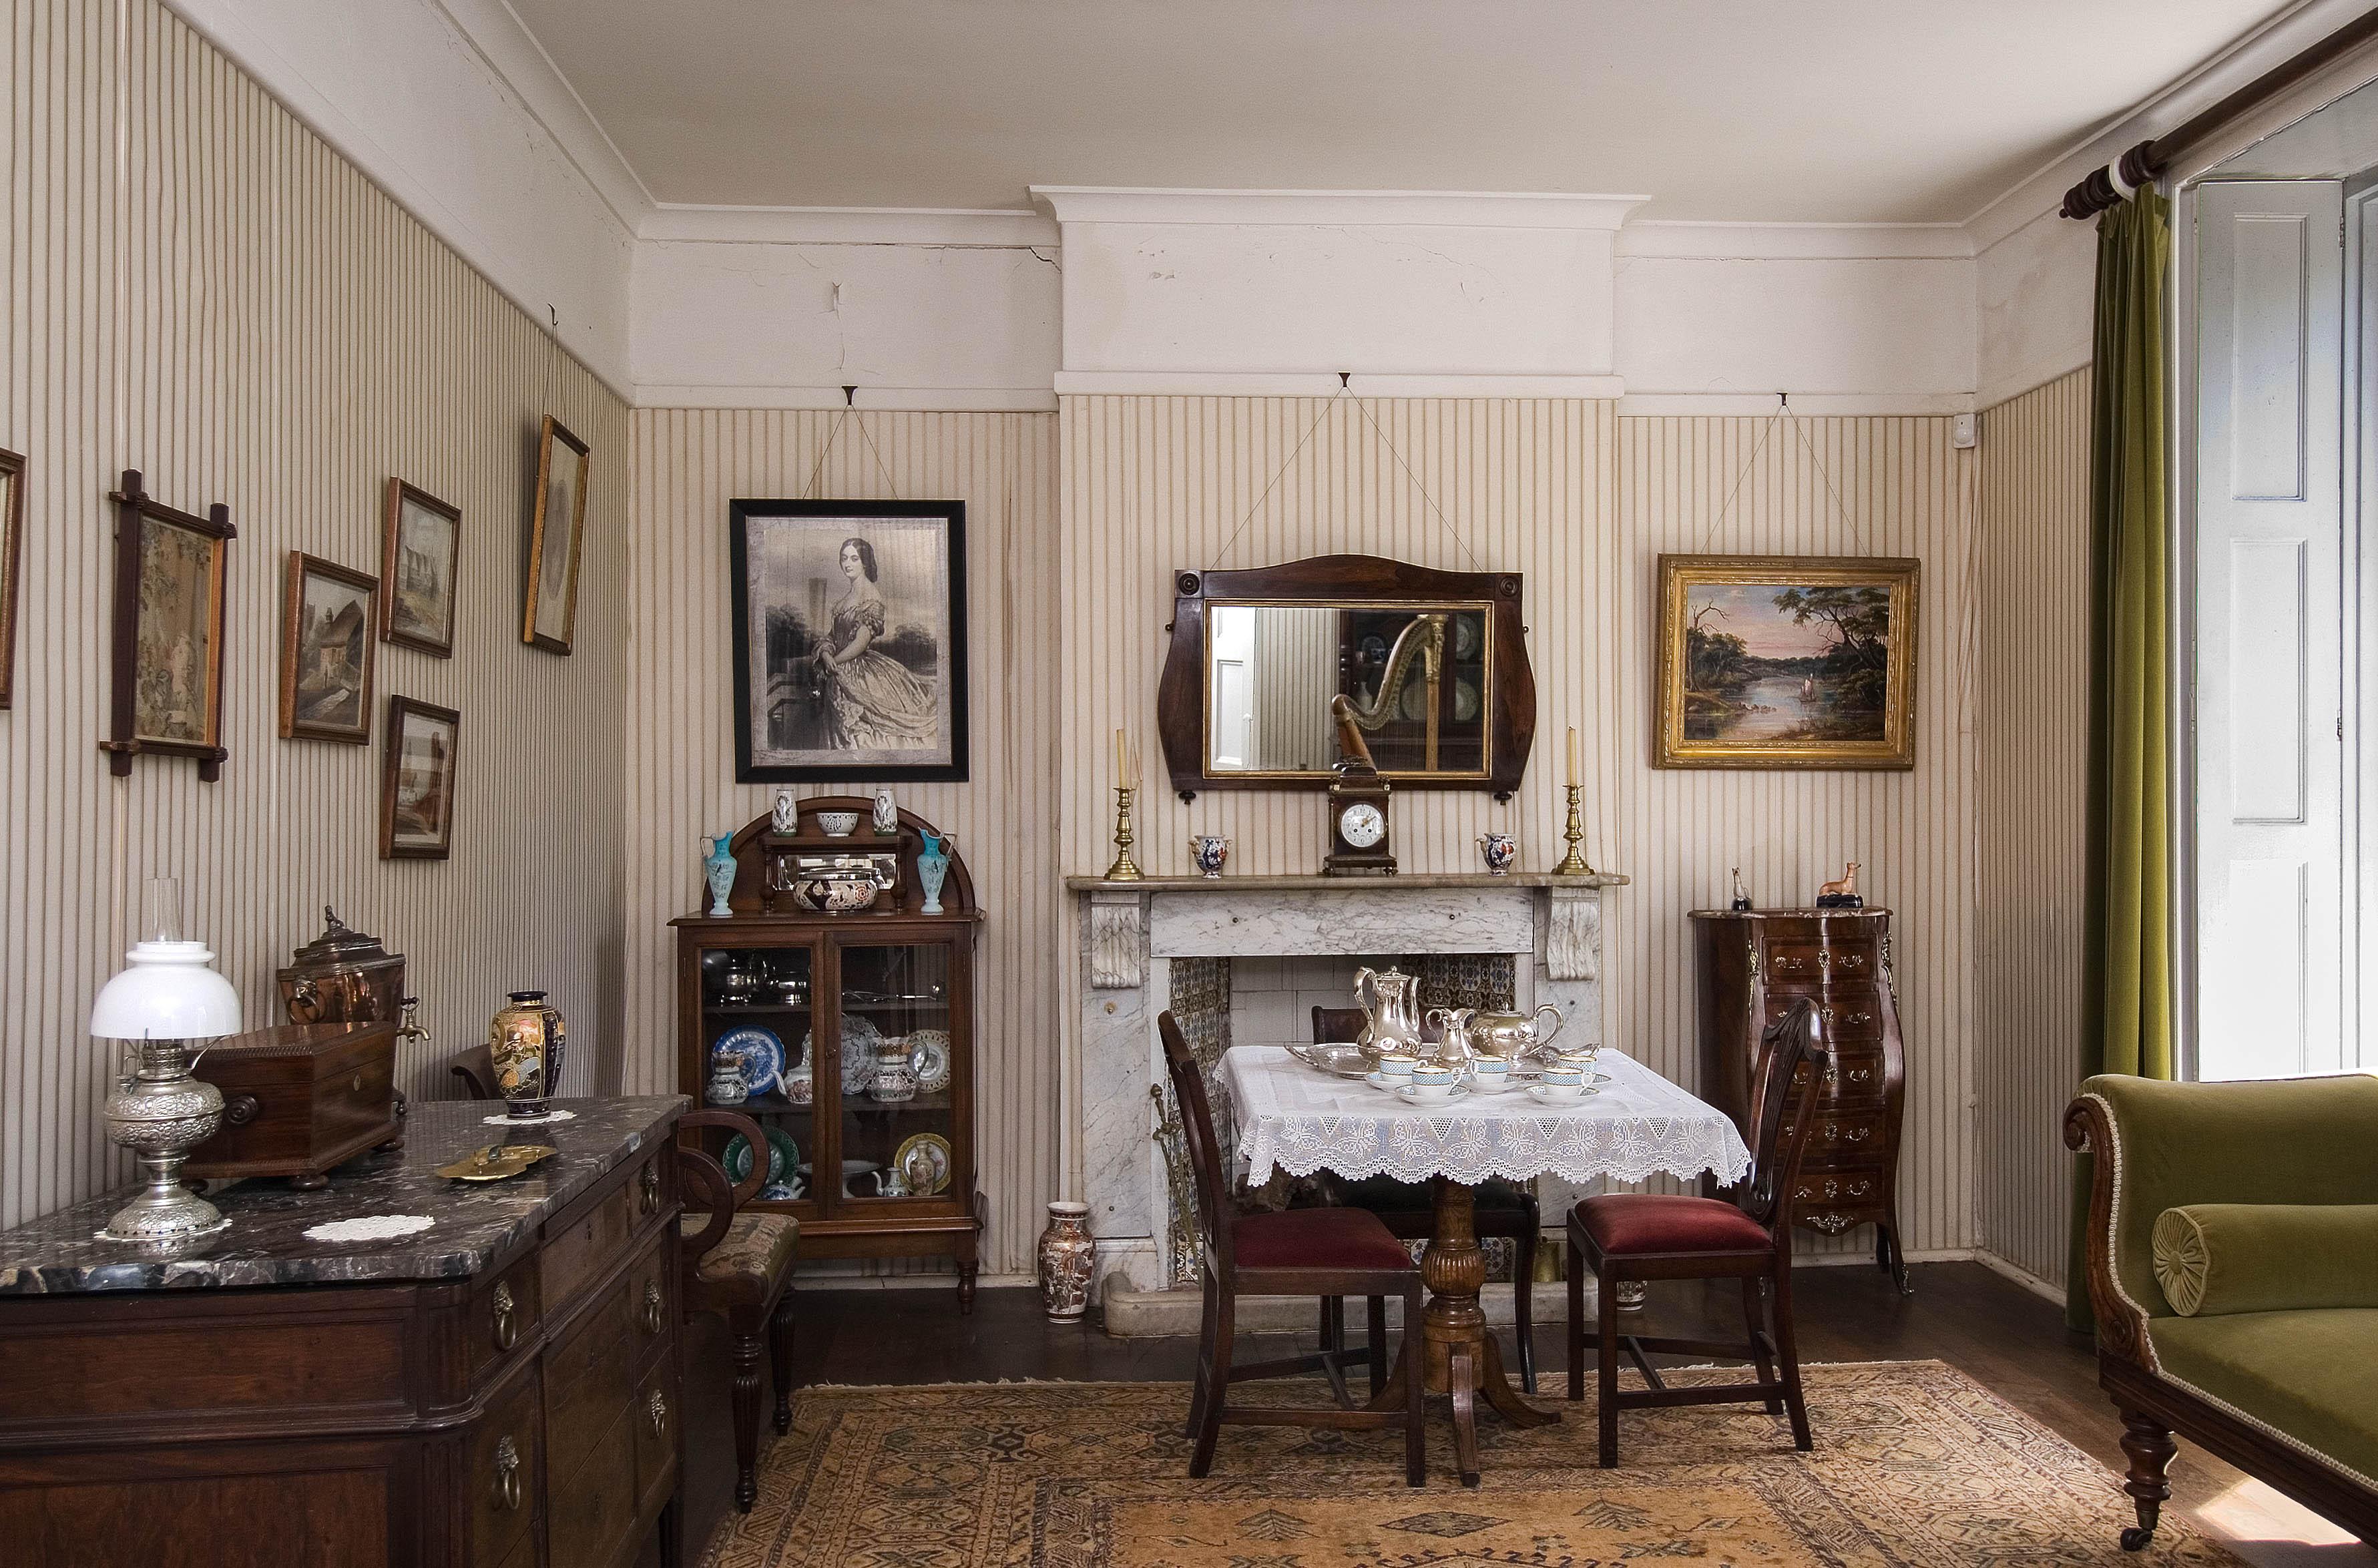 File:Old Farm, drawing room.jpg - Wikipedia